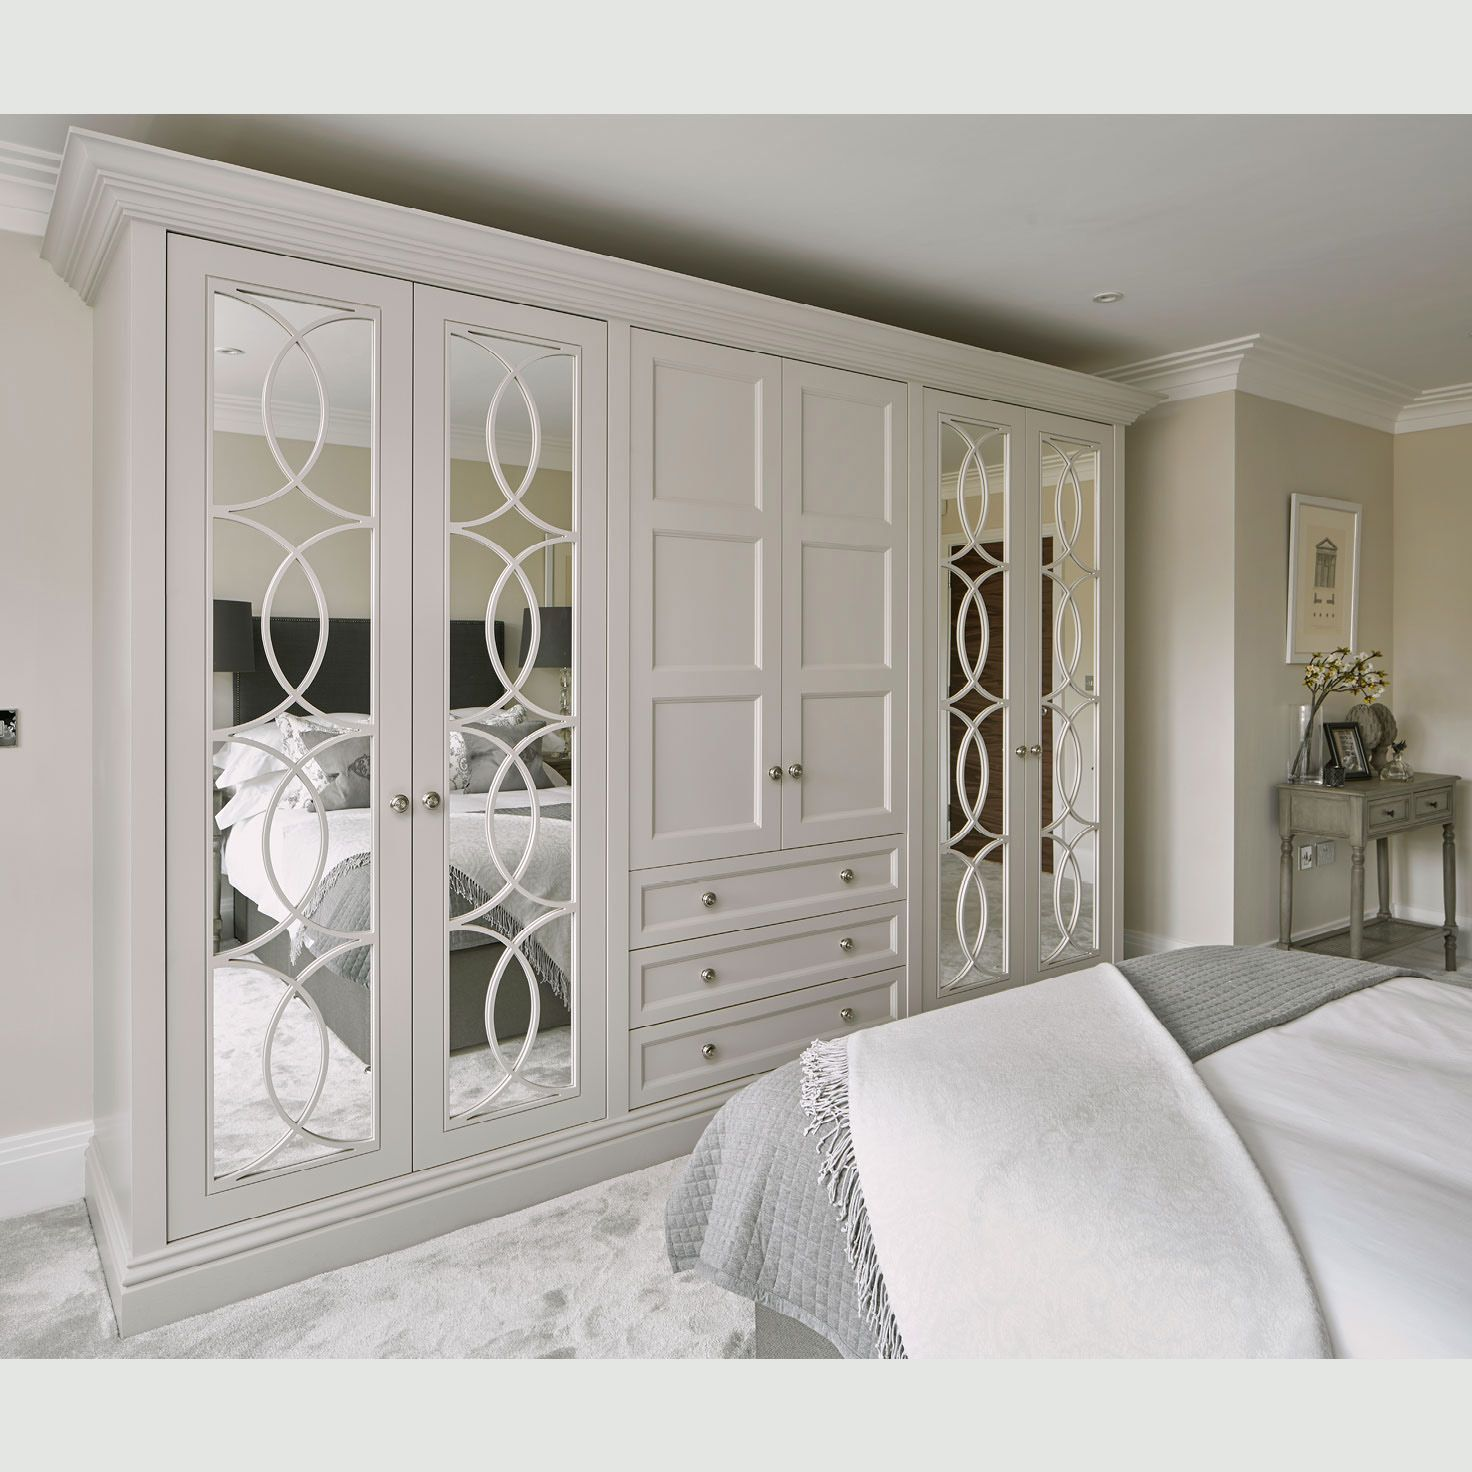 Empire Design Wardrobe Handmade Mirrored Fitted